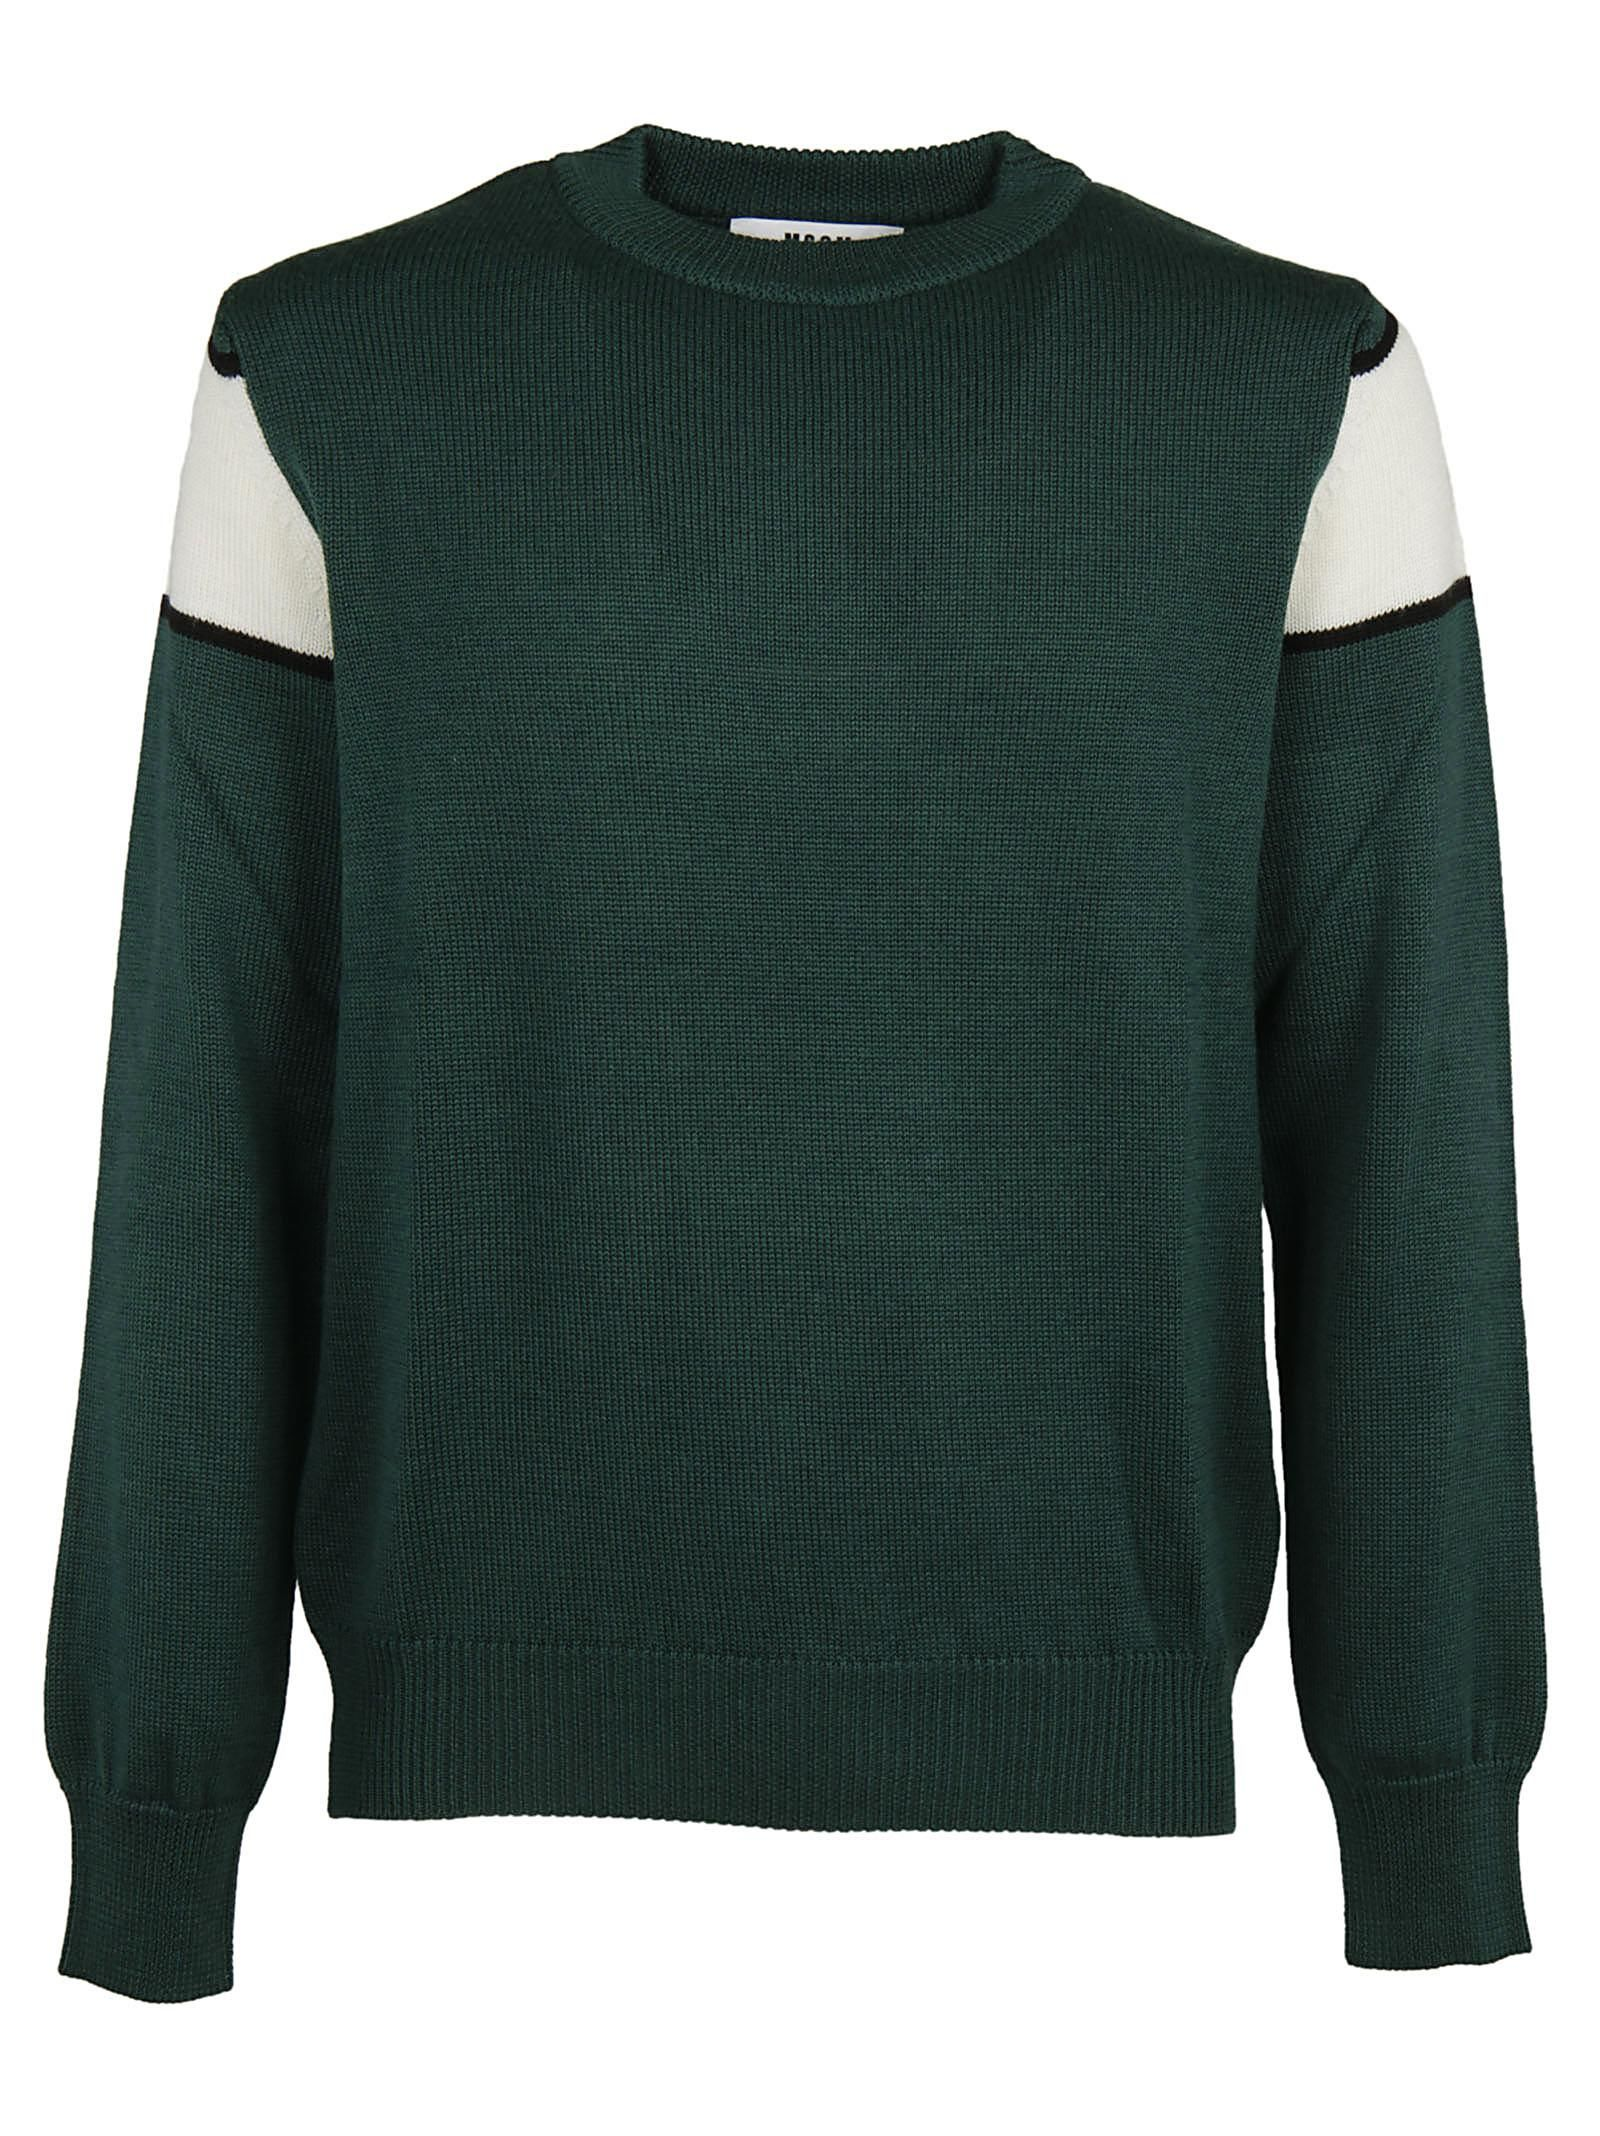 Msgm Intarsia Sweater